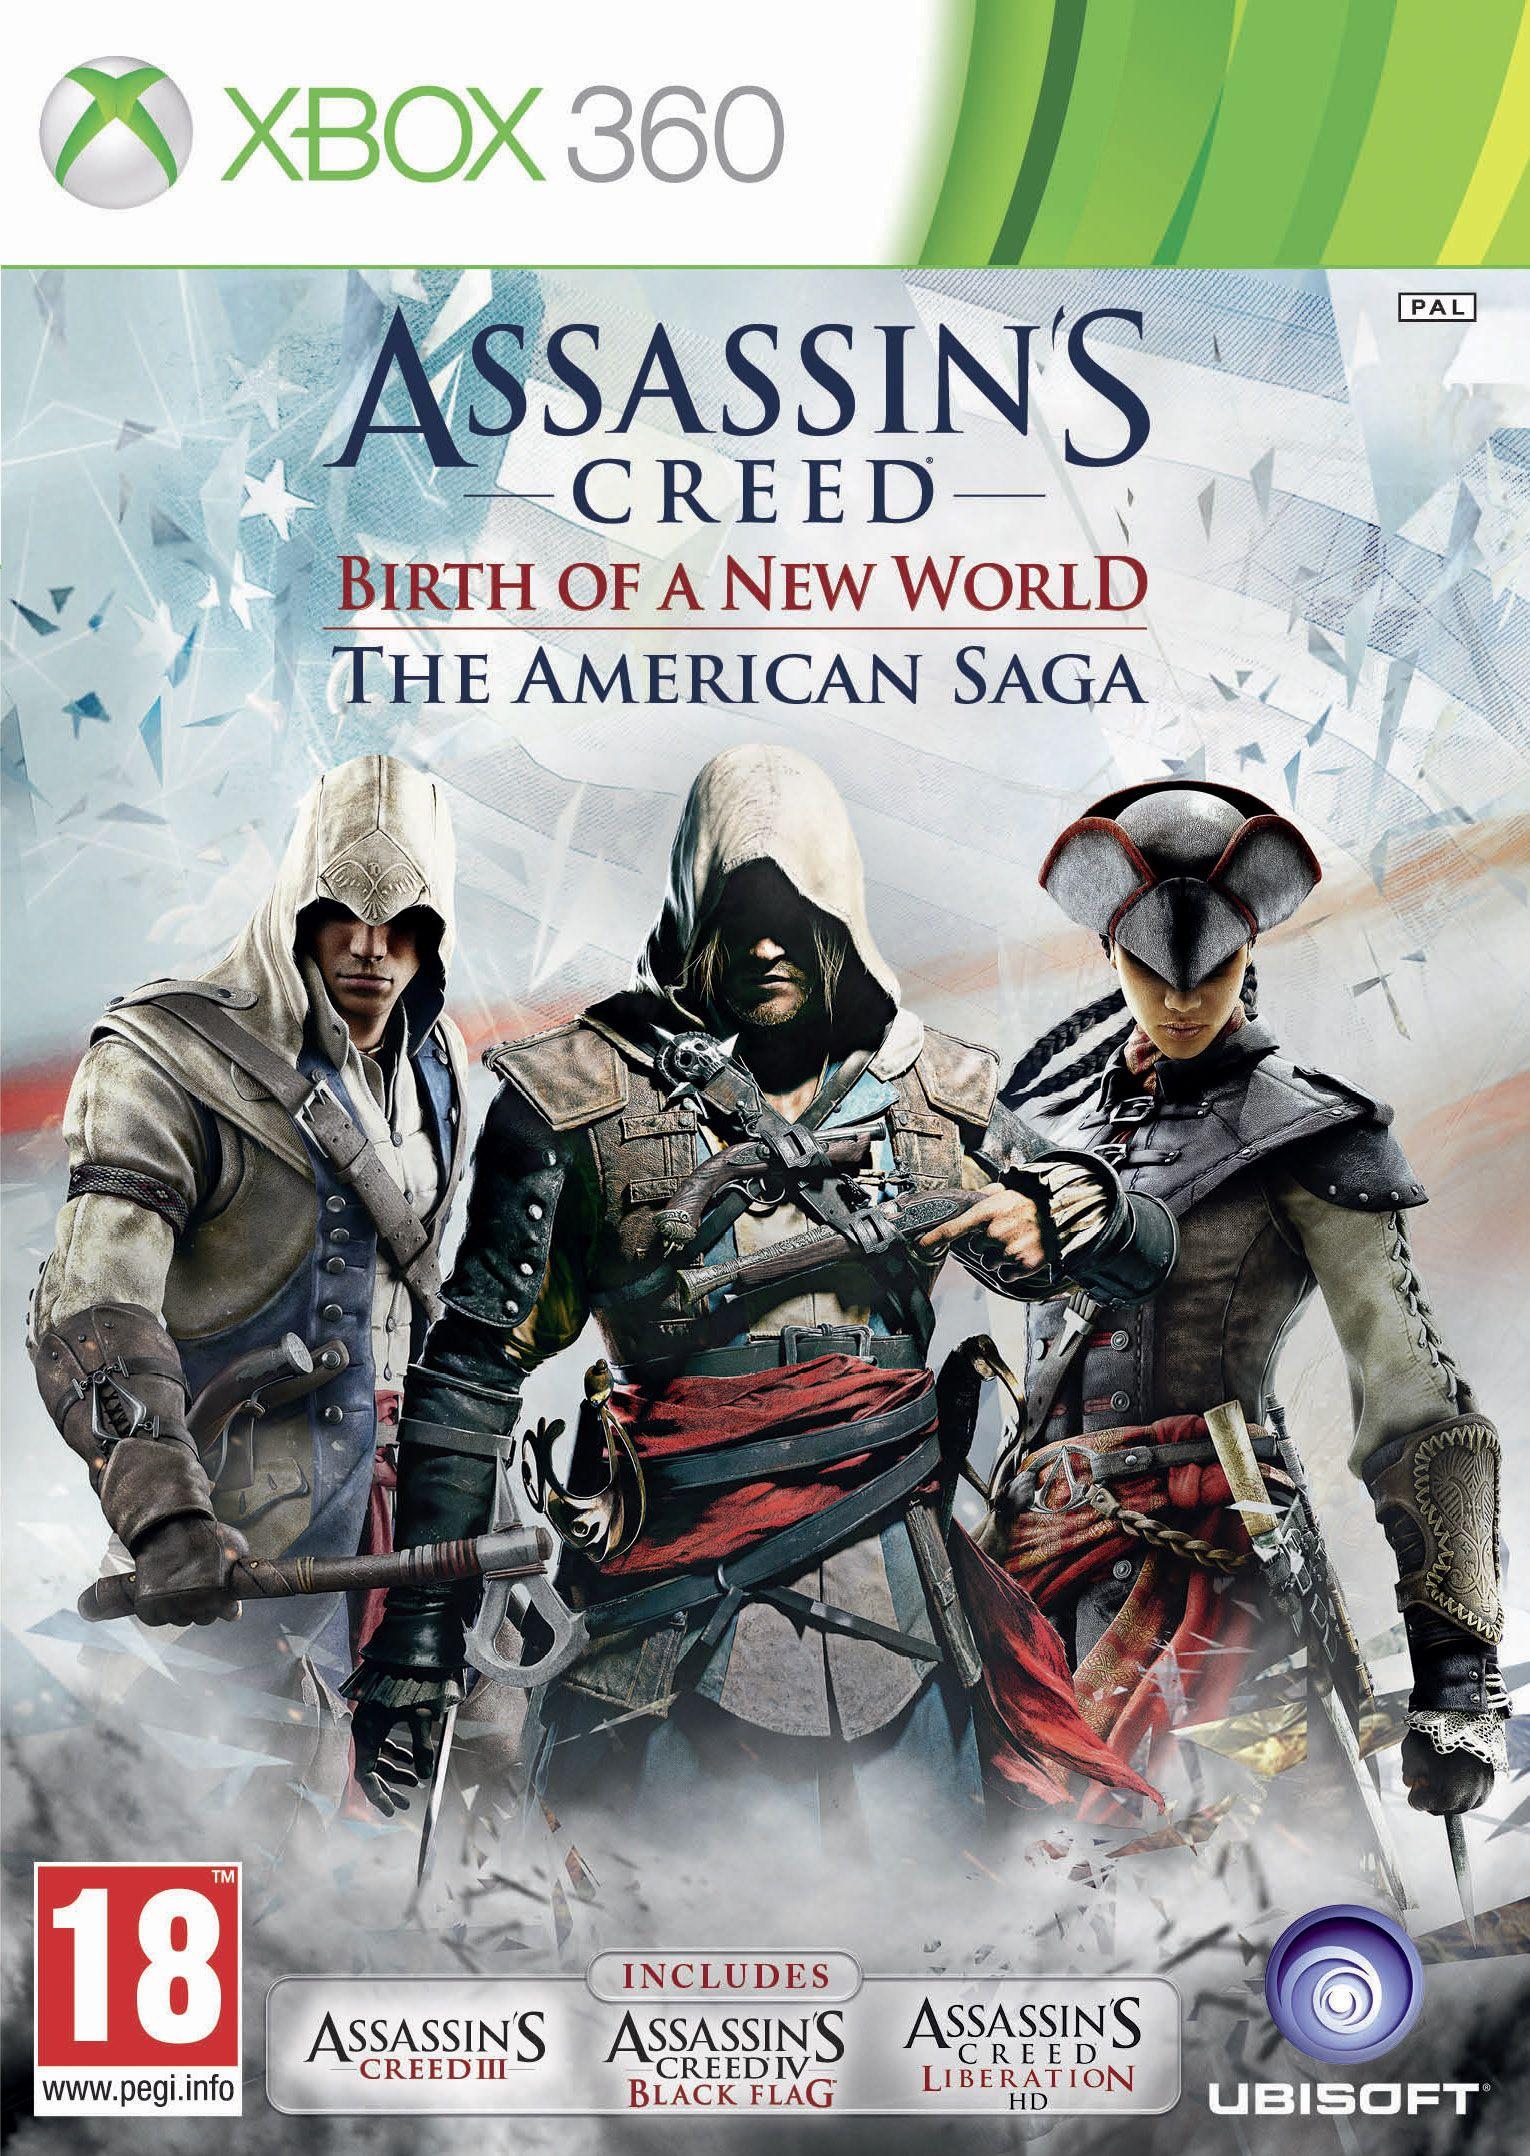 Includes Assassins Creed Lll Assassins Creed Black Flag